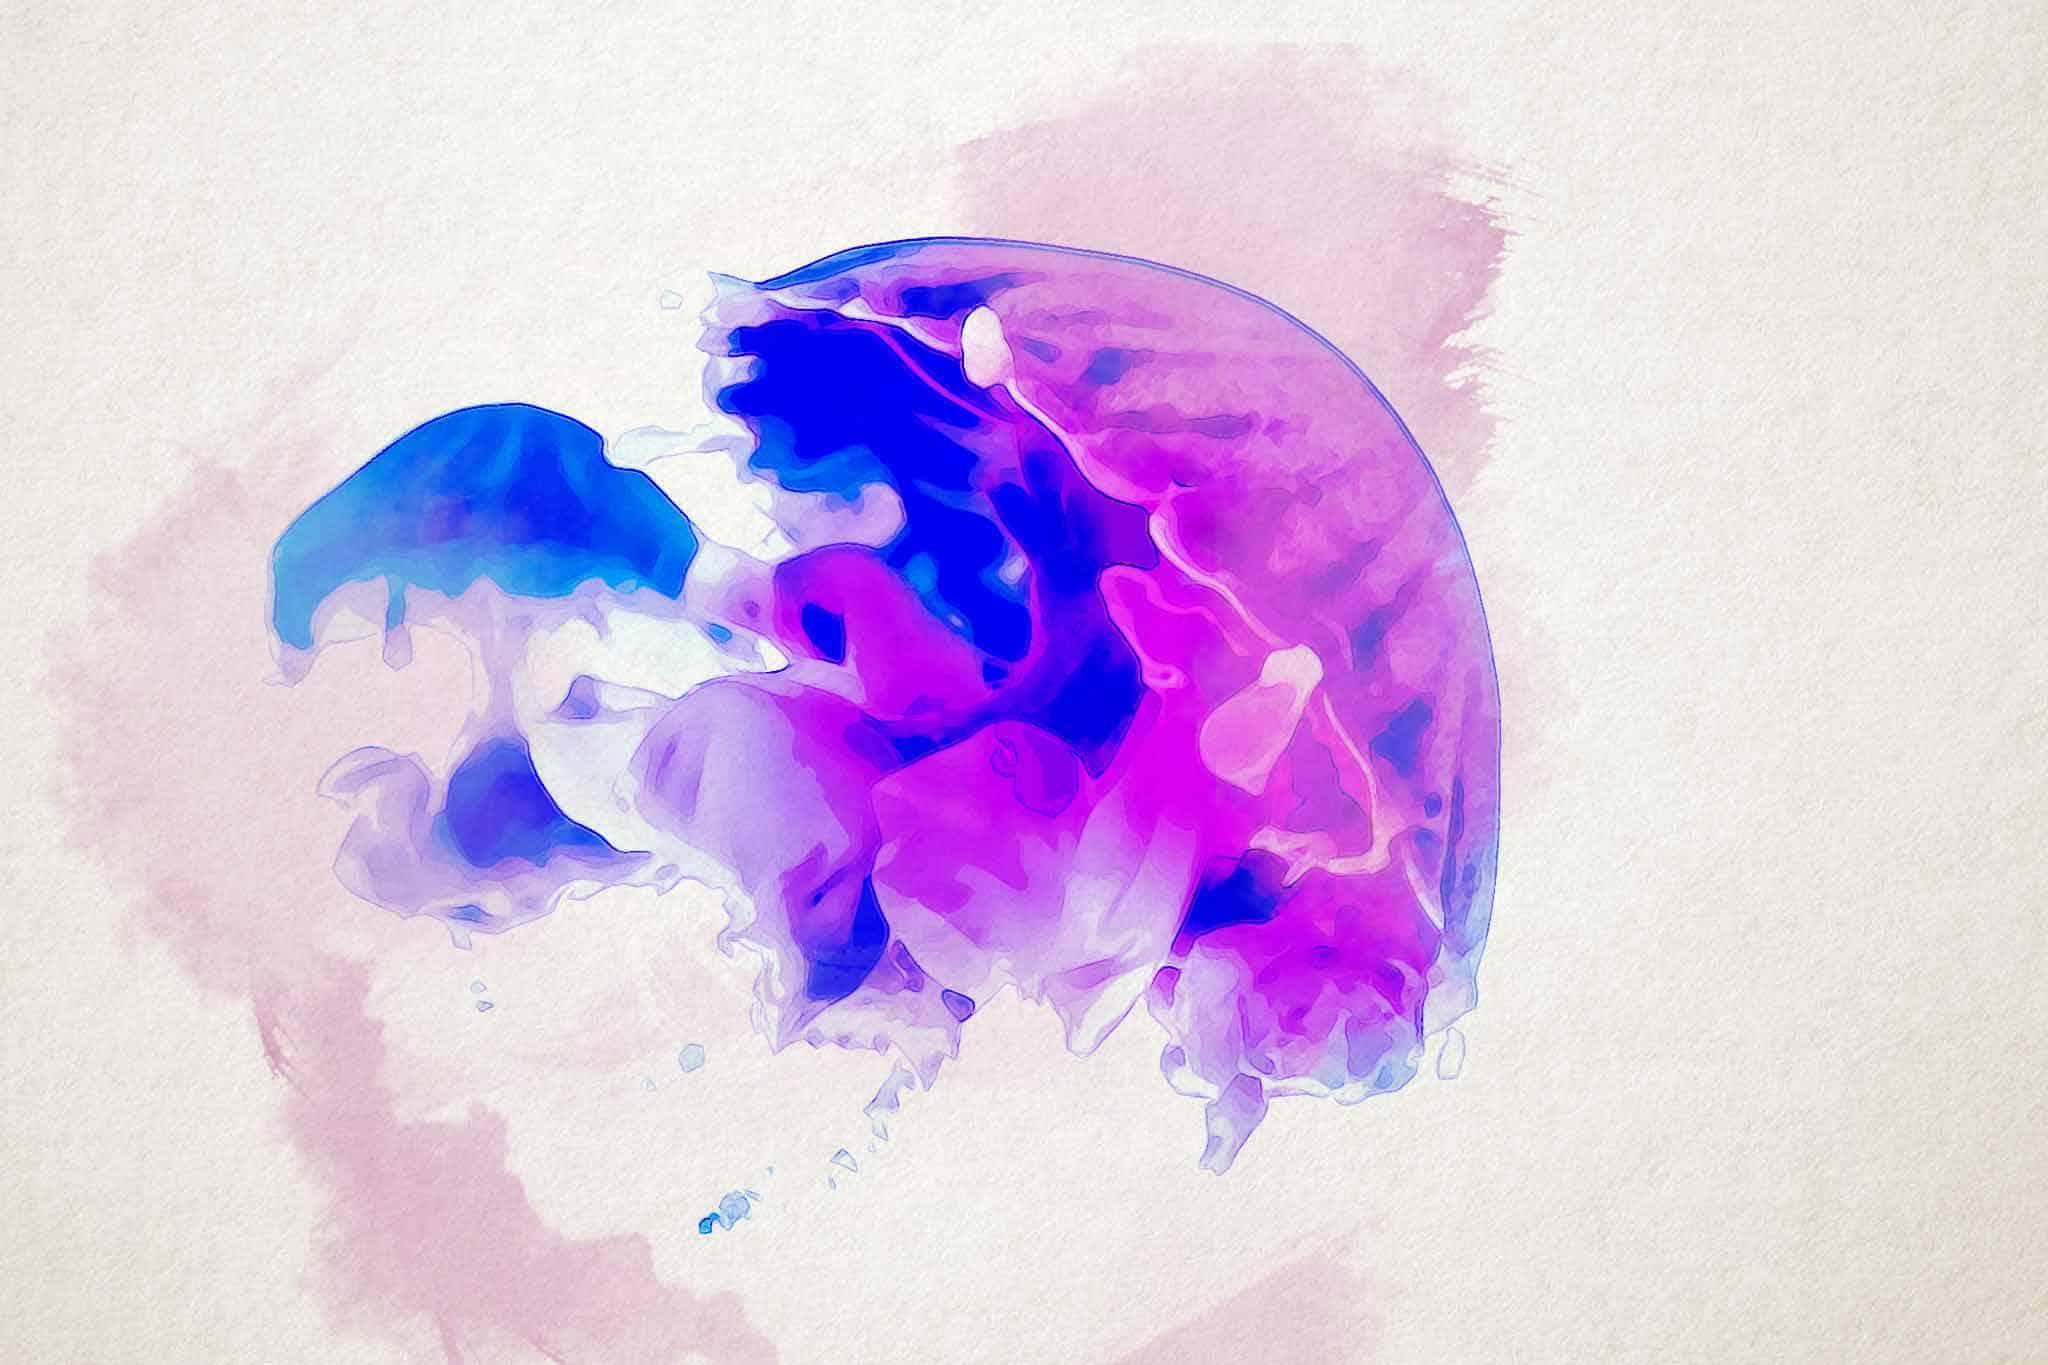 jellyfish pink blue